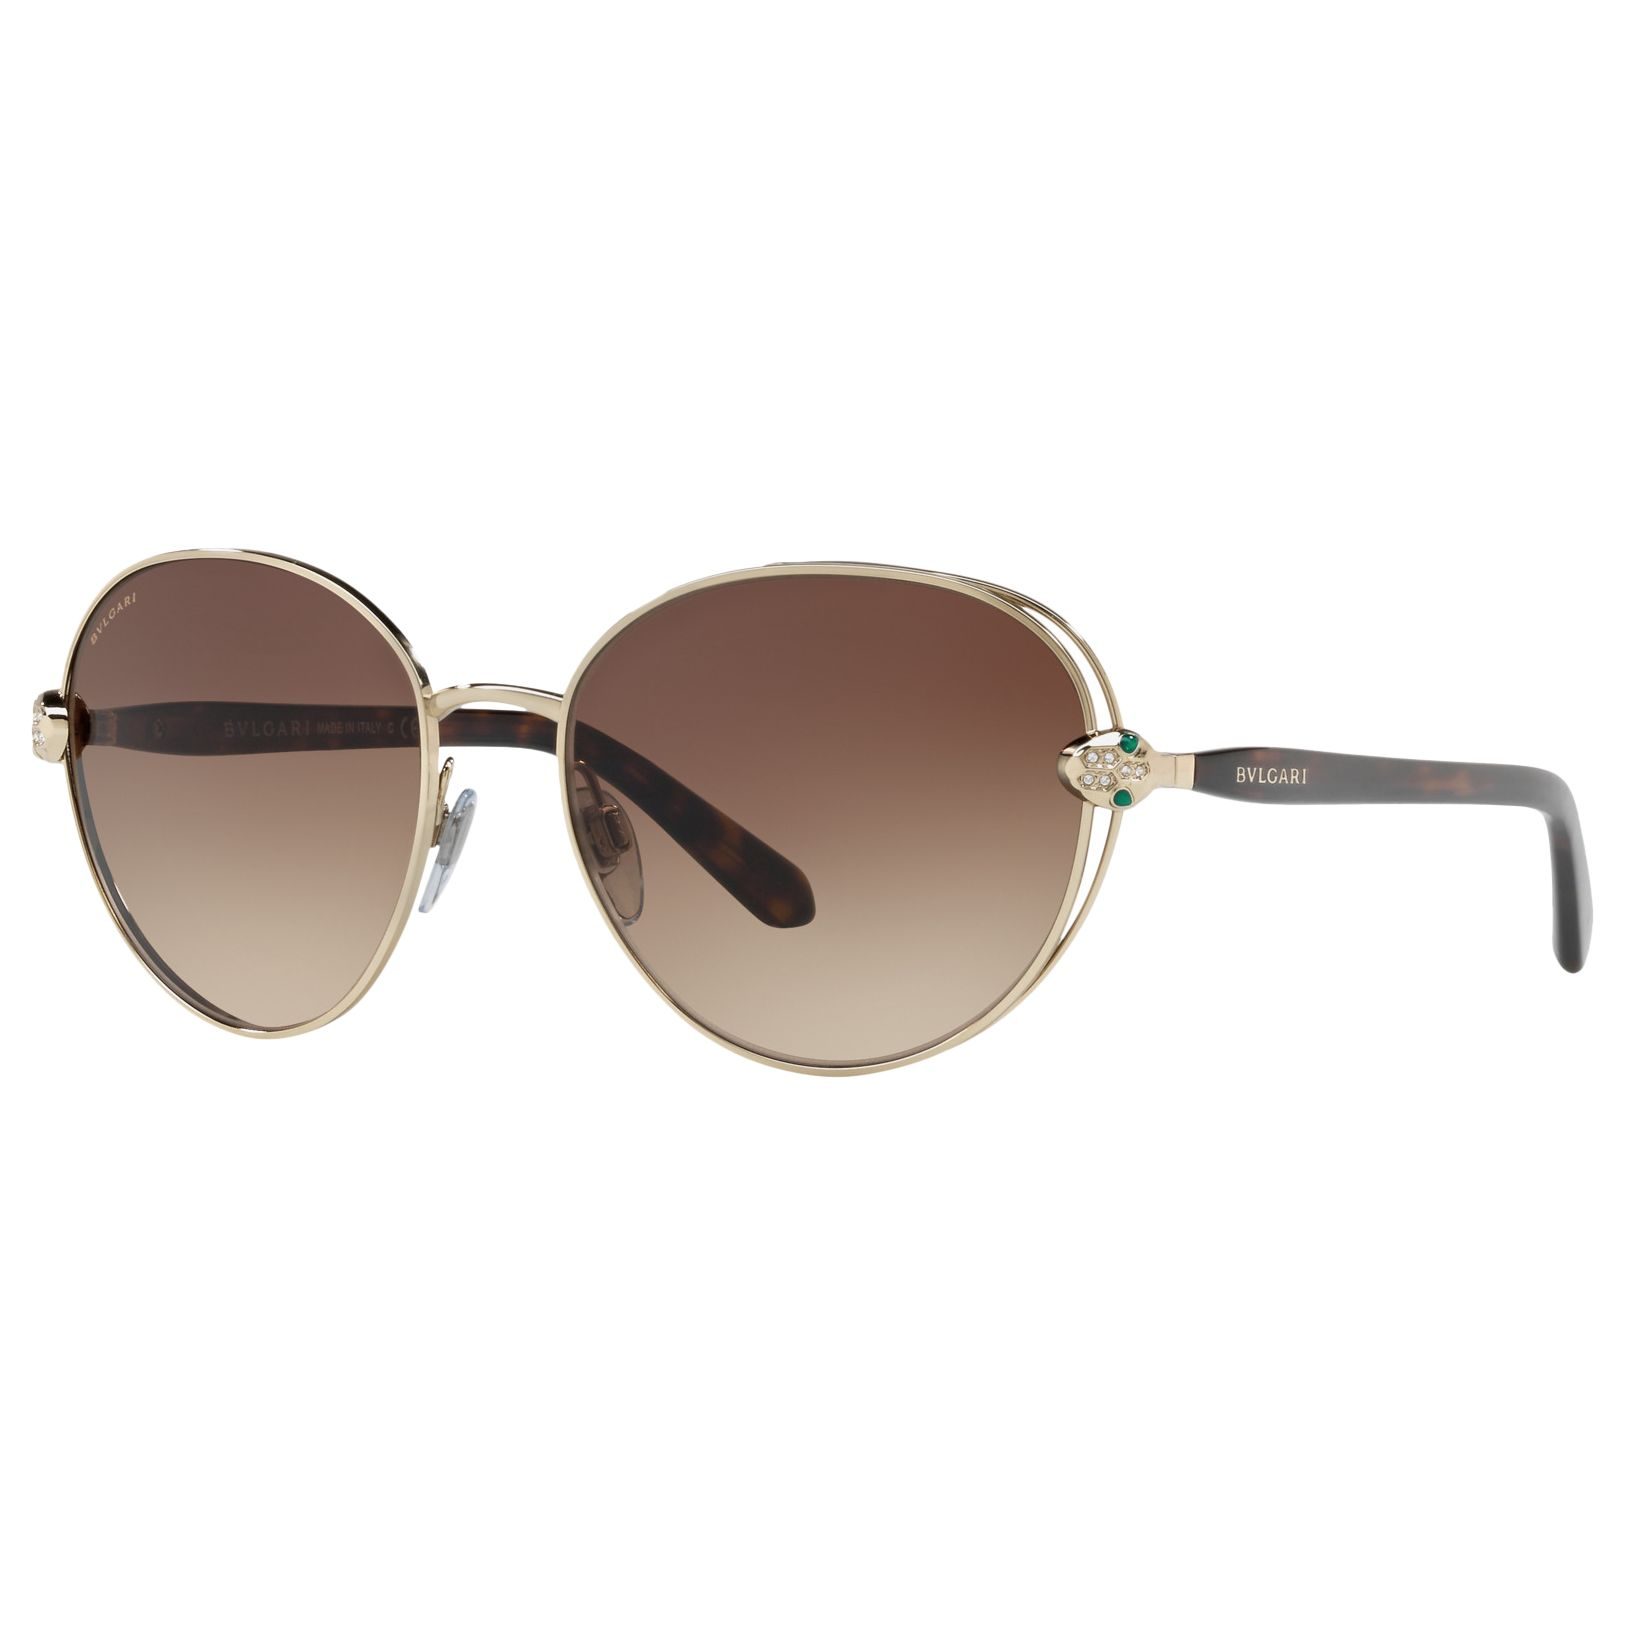 Bvlgari BVLGARI BV6087B Embellished Oval Sunglasses